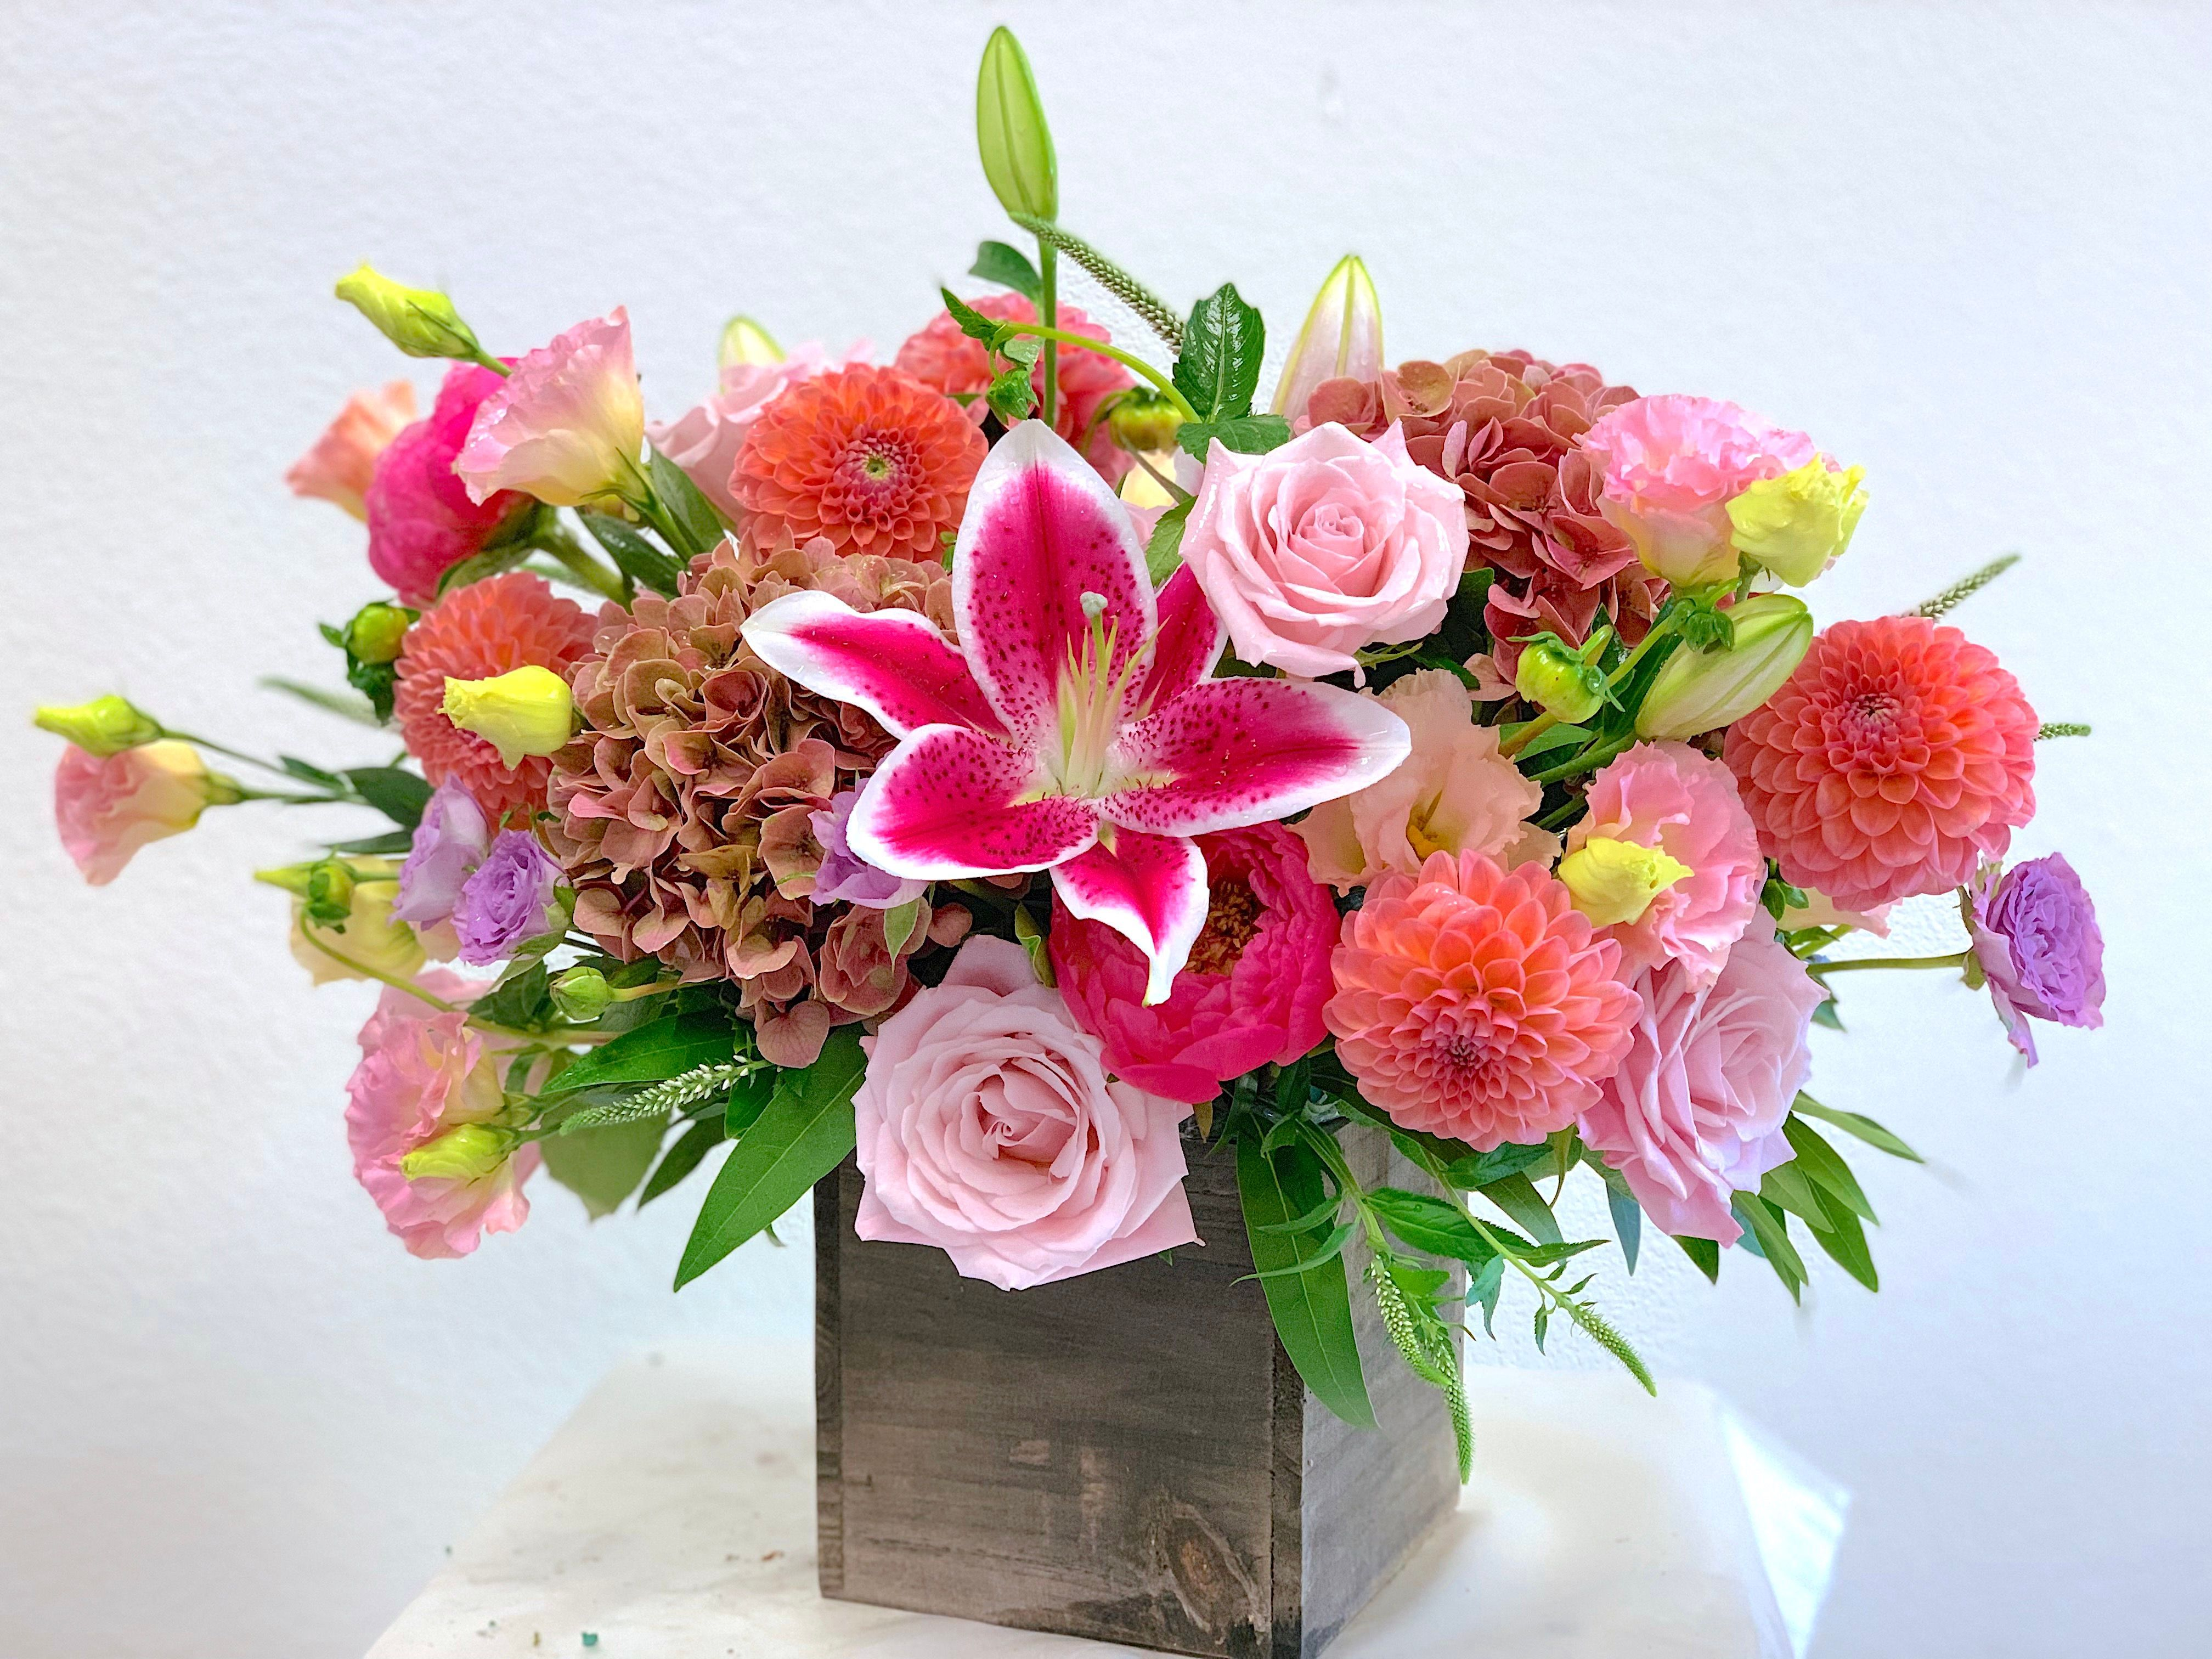 Parfums D Amour Carlsbad Florist Fleur D Elegance Real Local Flower Delivery Carlsbad Ca 92010